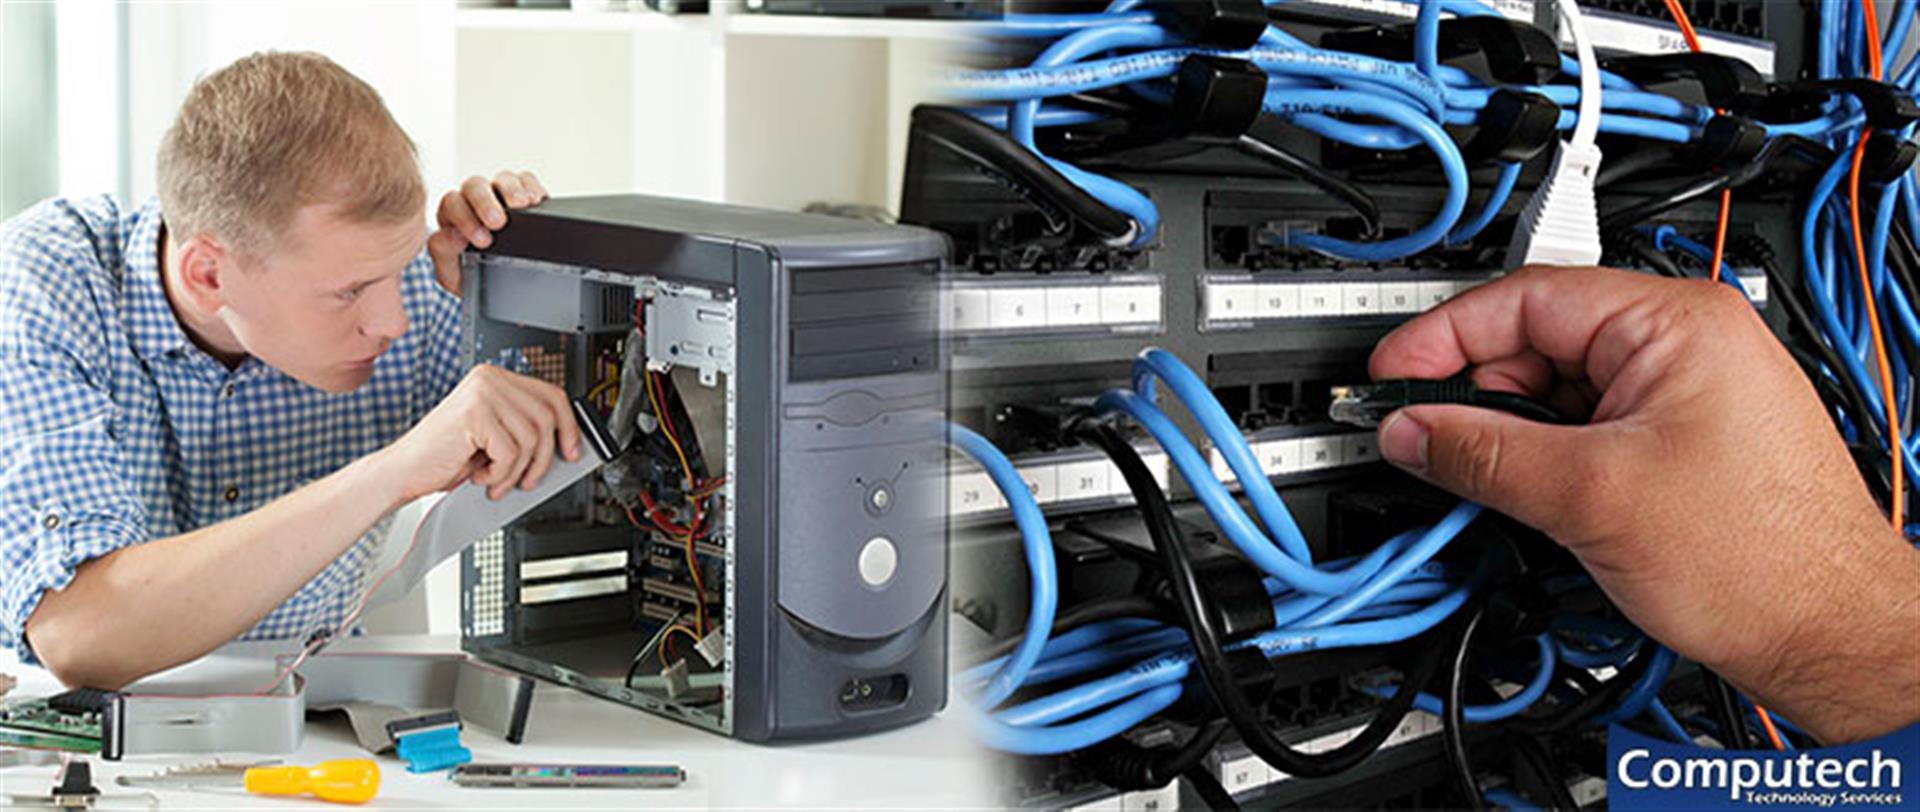 Thomaston Georgia On Site Computer PC & Printer Repair, Networks, Voice & Data Cabling Contractors